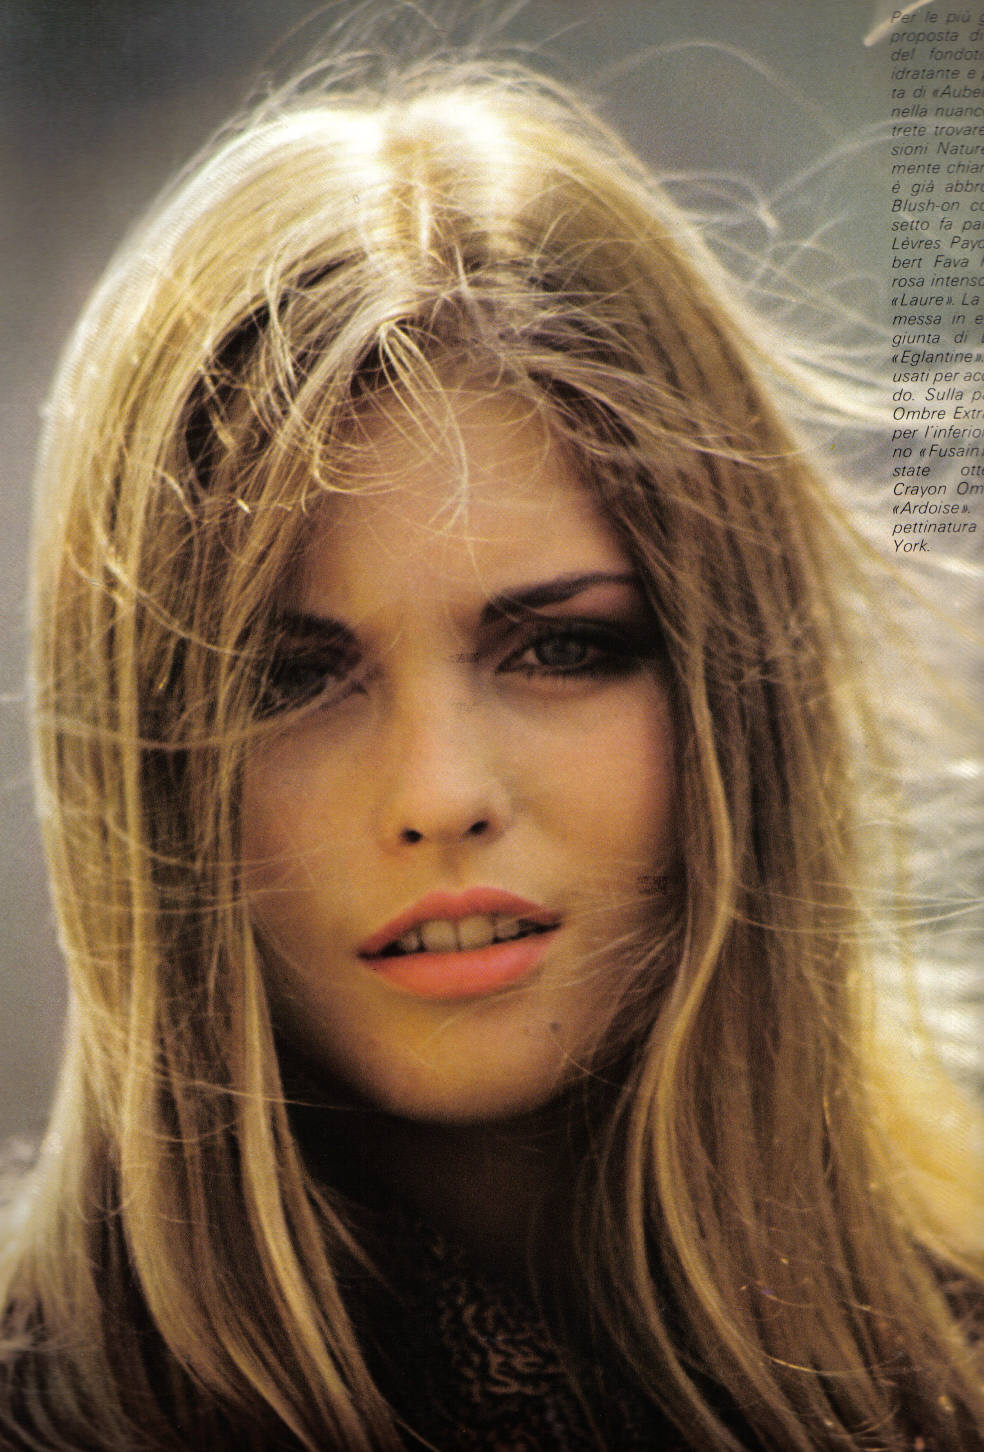 life on mars?!: Beauty Through the Decades: 80's